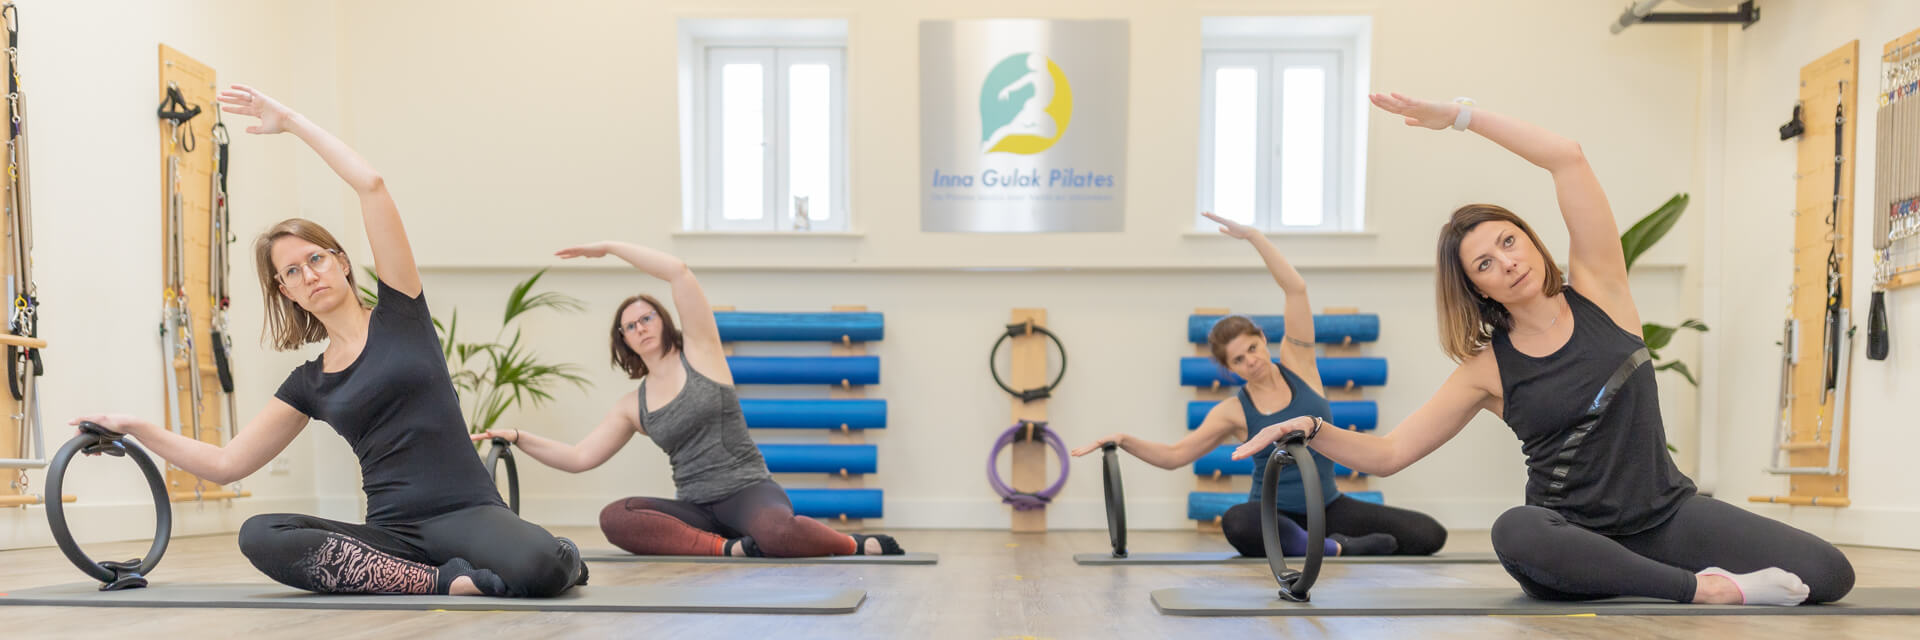 Pilates-reformer-groepslessen-Inna-Gulak-inna-Gulak-Pilates-Pilates-venlo-Pilates-groepslessen-Personal-Training-Pilates-Reformer-Pilates-Mat-Venlo-05